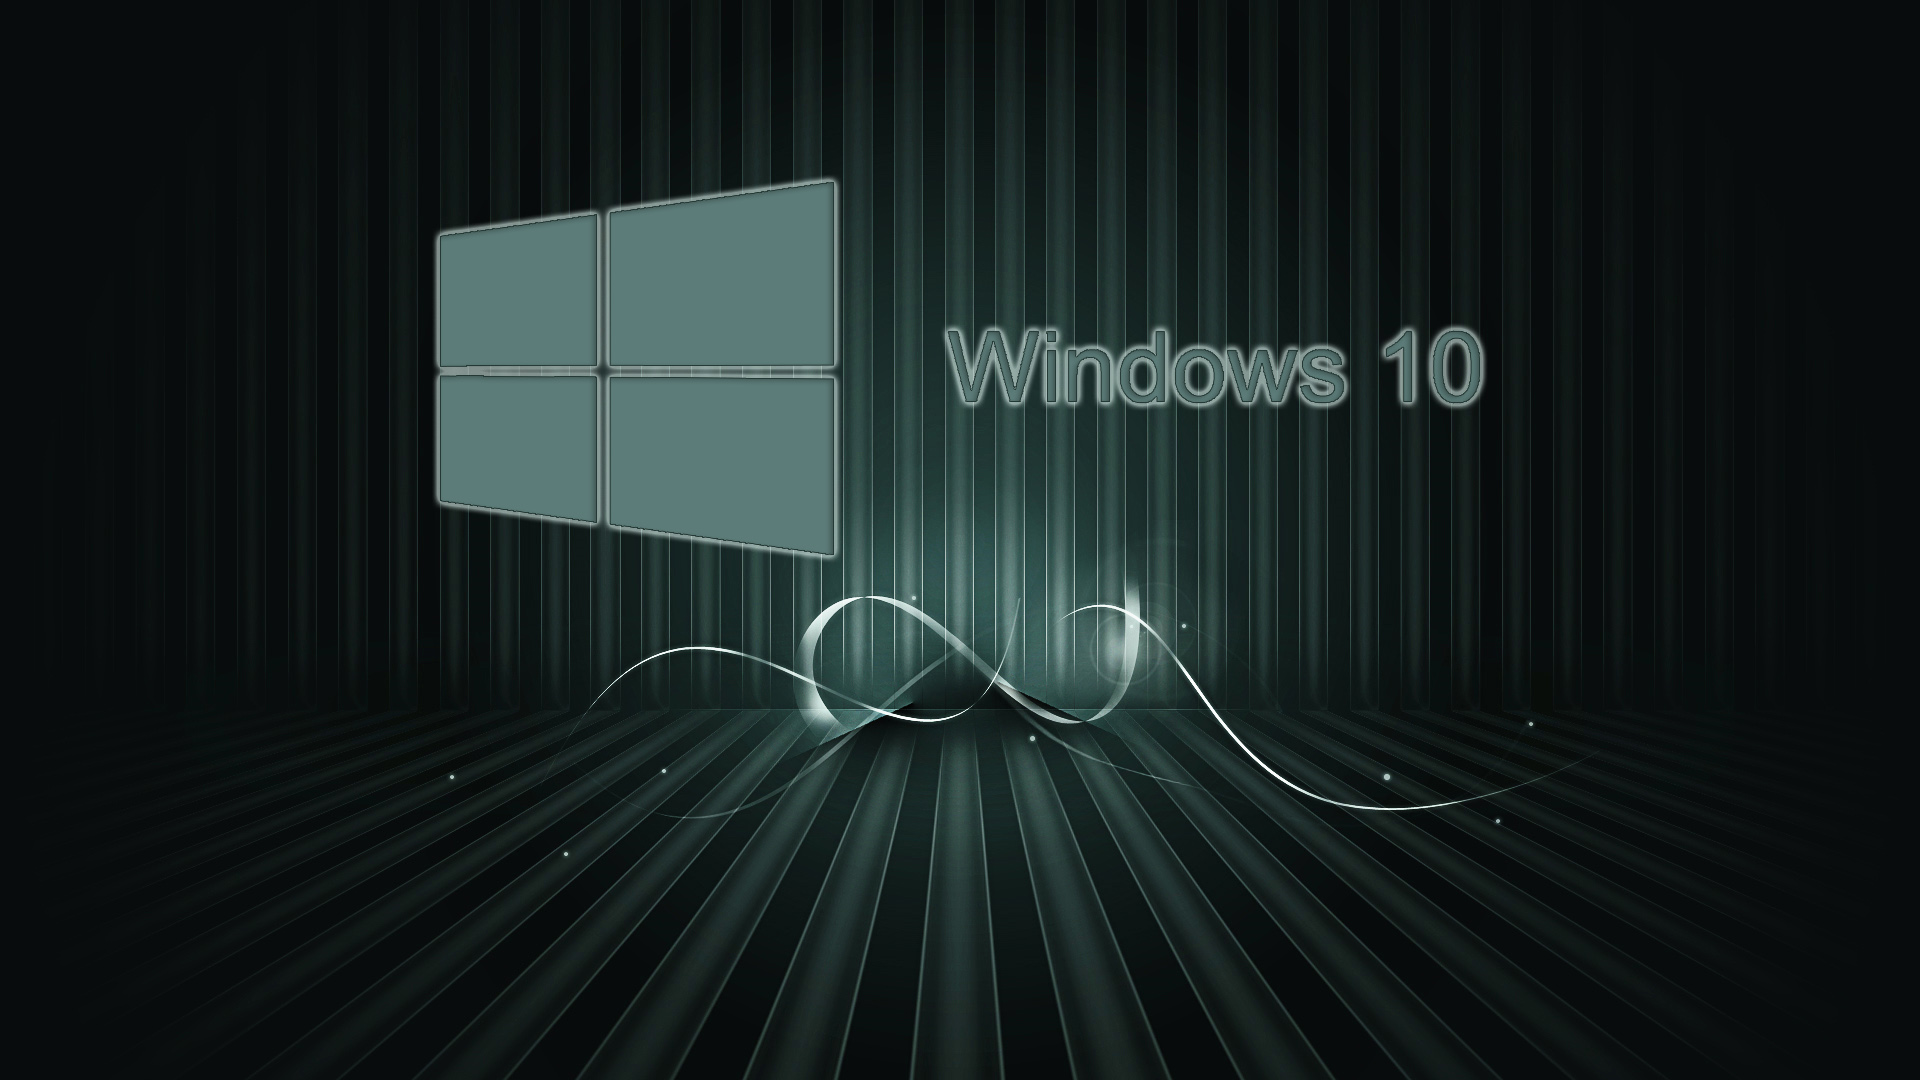 curve windows 10 wallpaper windows 10 logo hd 1920x1080